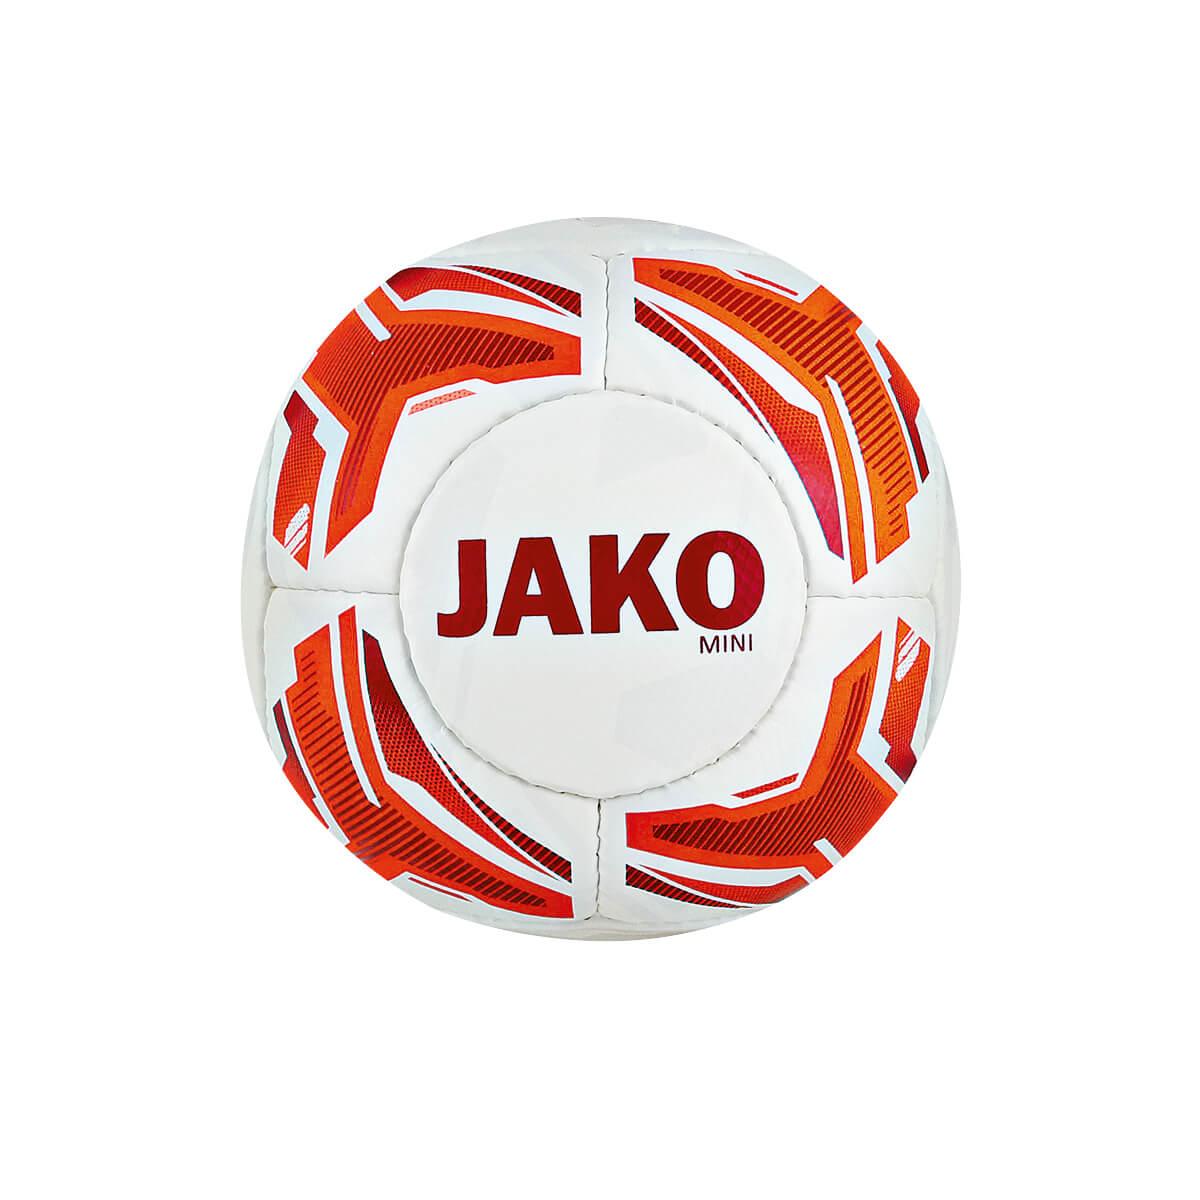 Jako Miniball Striker  2385  | div. Größen / Farben